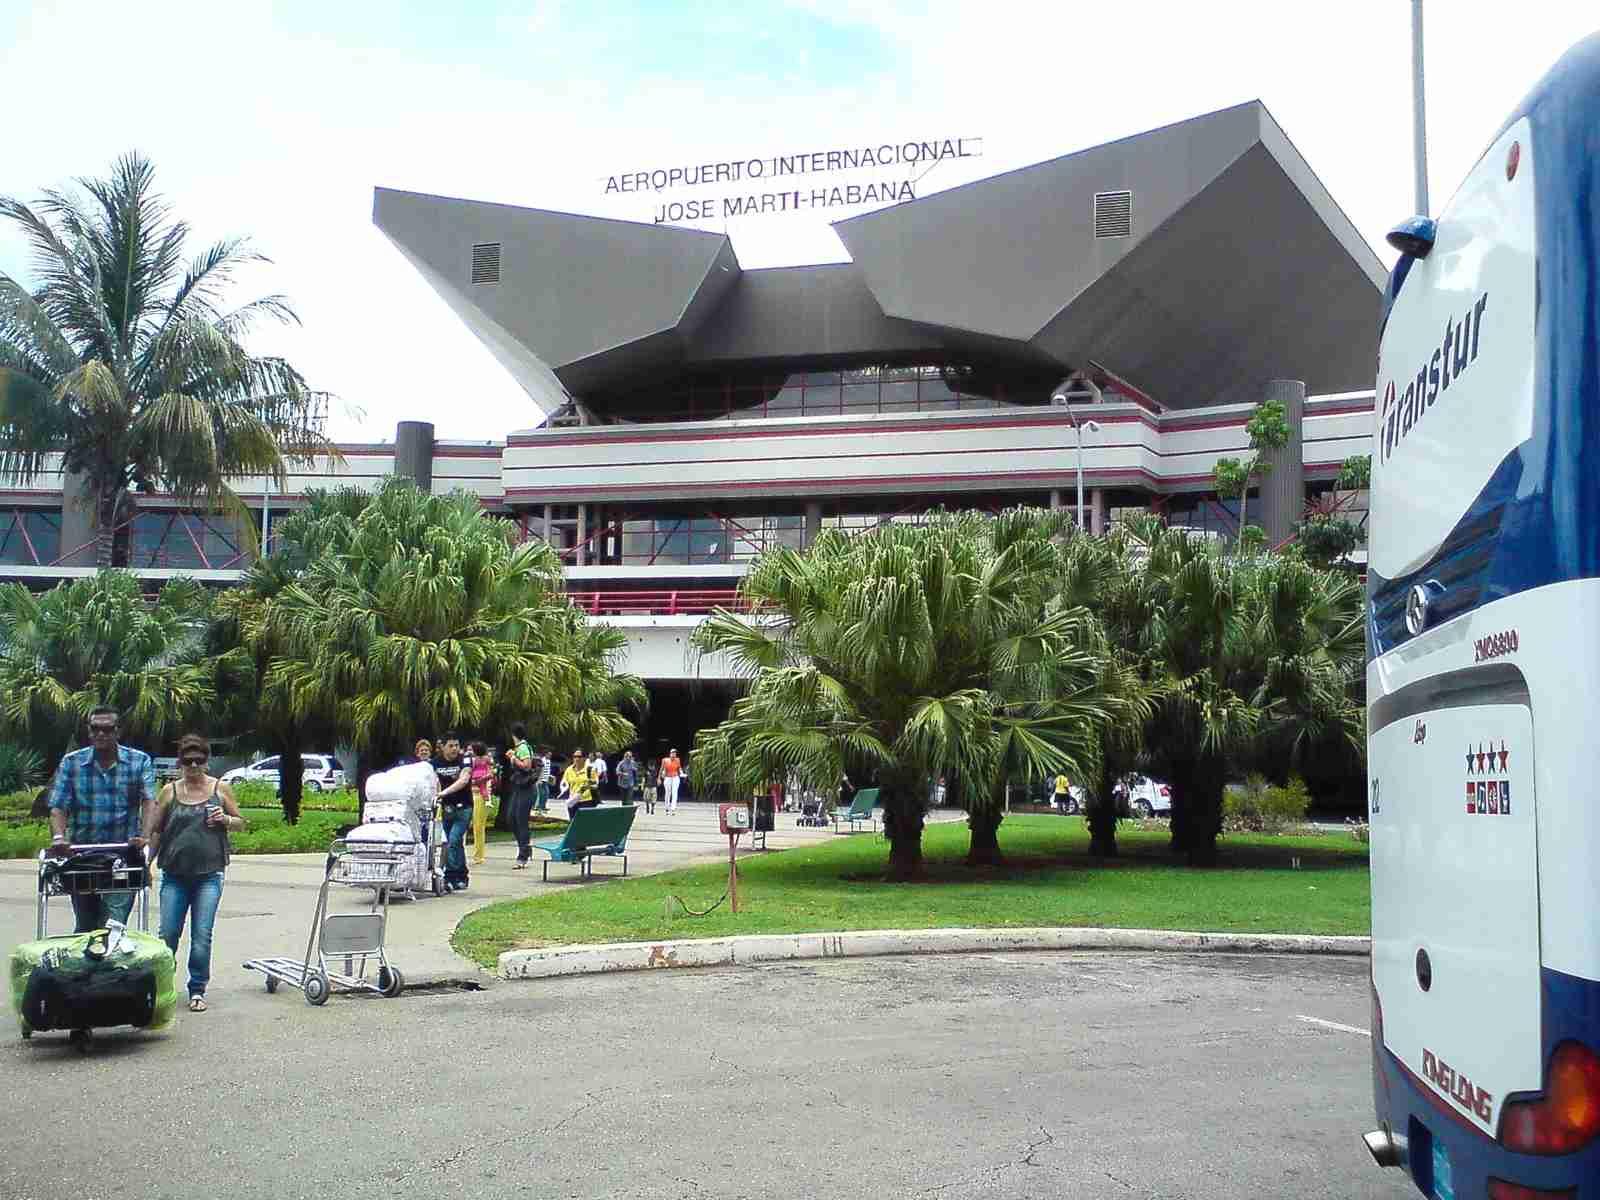 Aeropuerto José Martí. (Photo via Wikipedia)